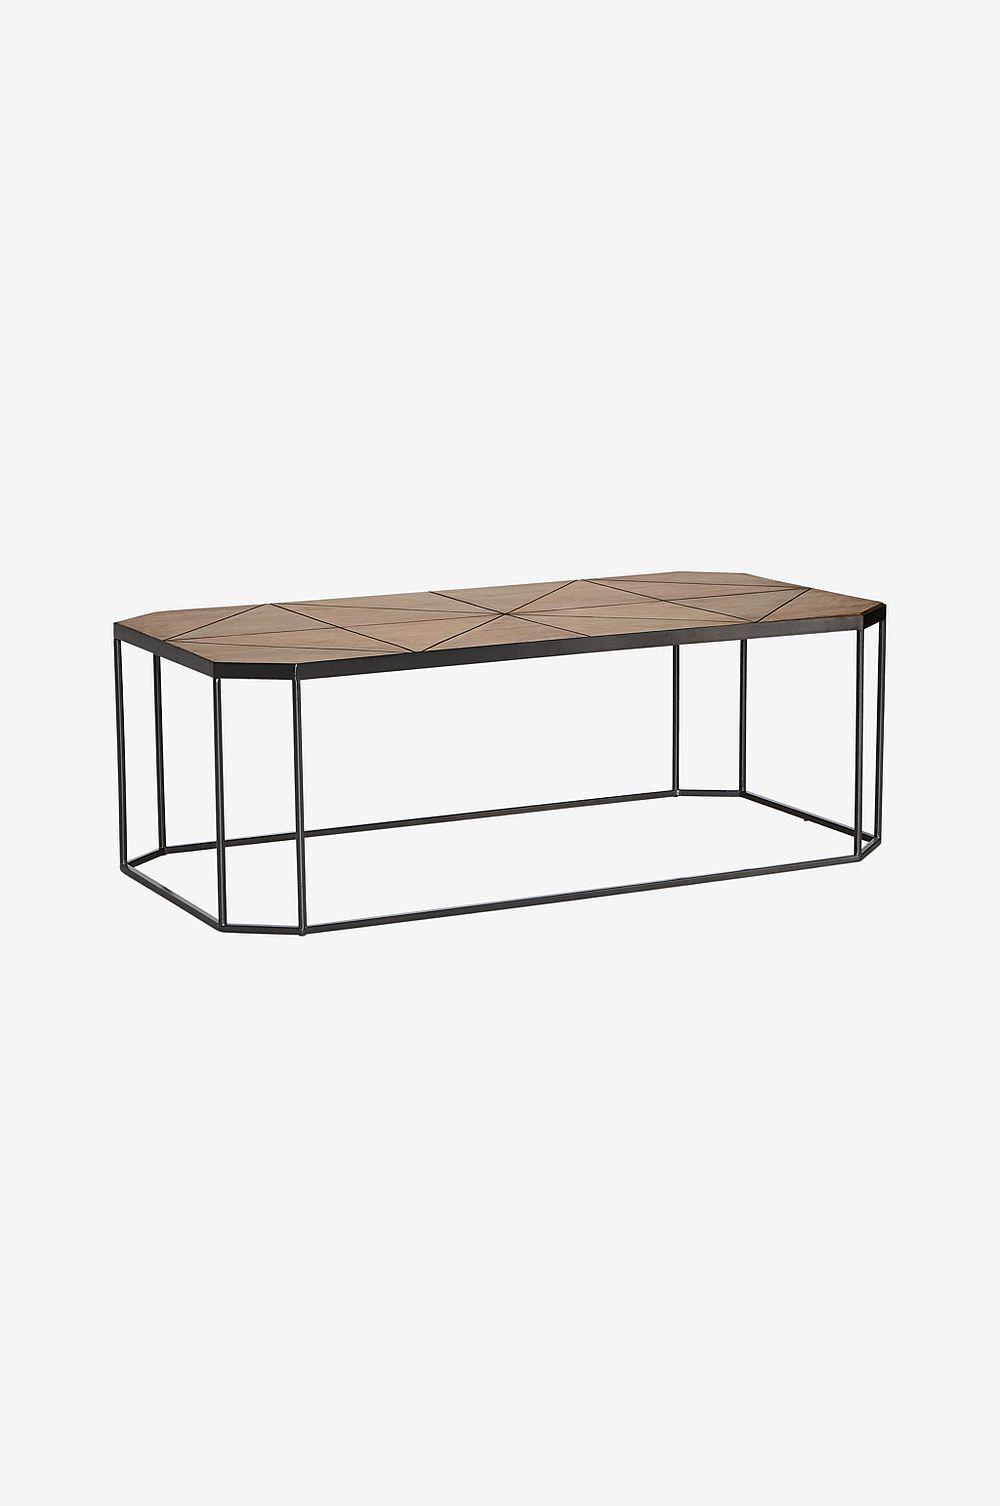 Soffbord : Köp trendiga vardagsrumsbord online – Ellos.se